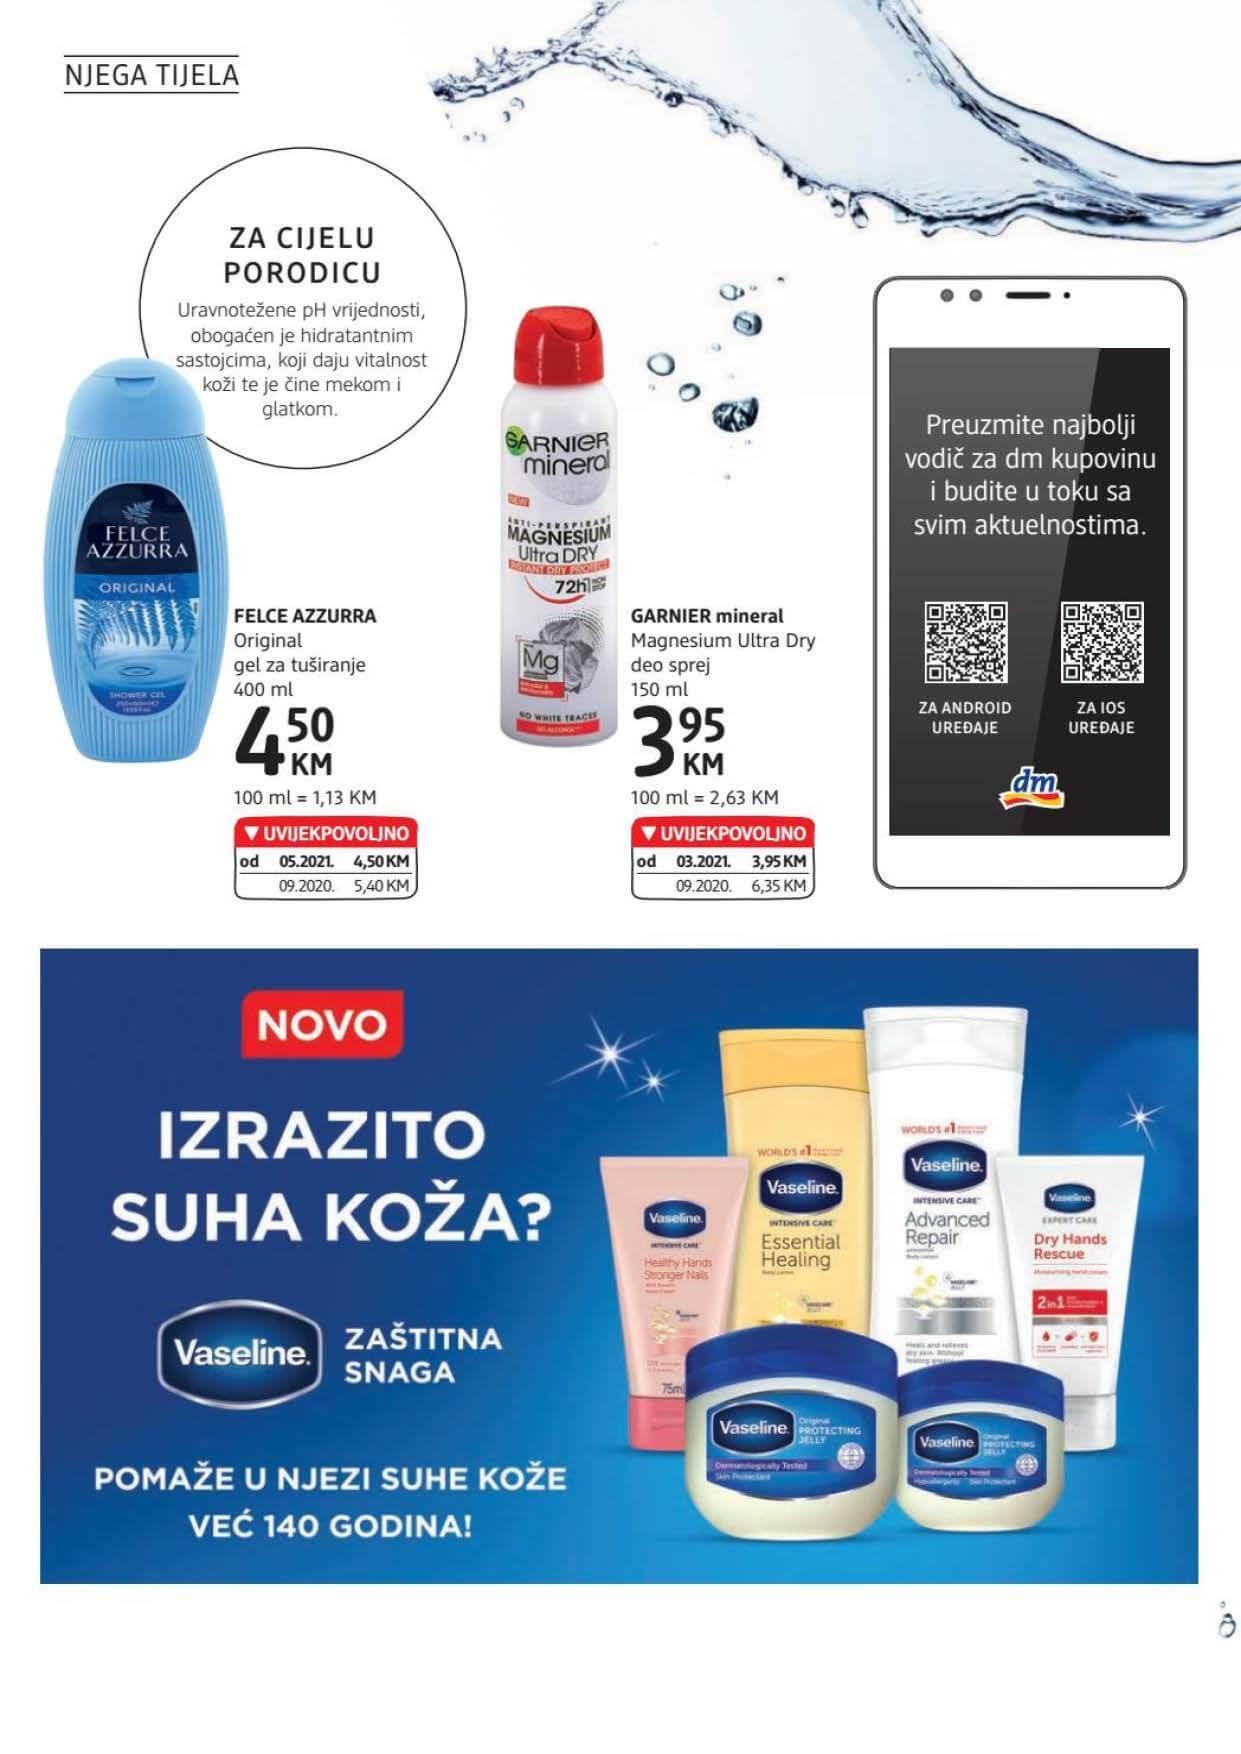 DM Katalog BiH JUN JUL 2021 23.6.2021. 6.7.2021. eKatalozi.com PR Page 10